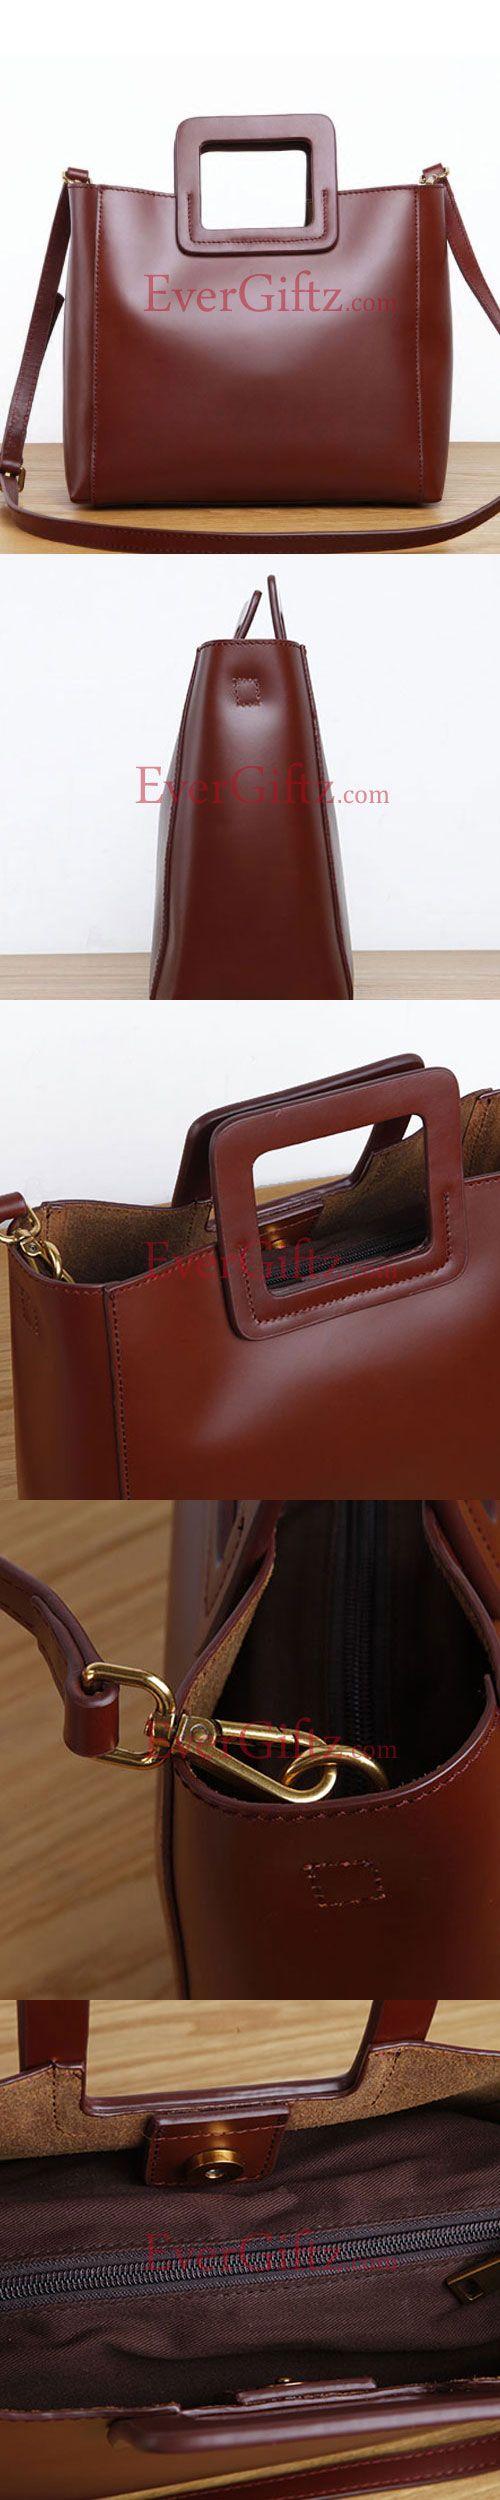 Genuine leather handbag purse bag women fashion vintage women handbag shoulder bag crossbody bag